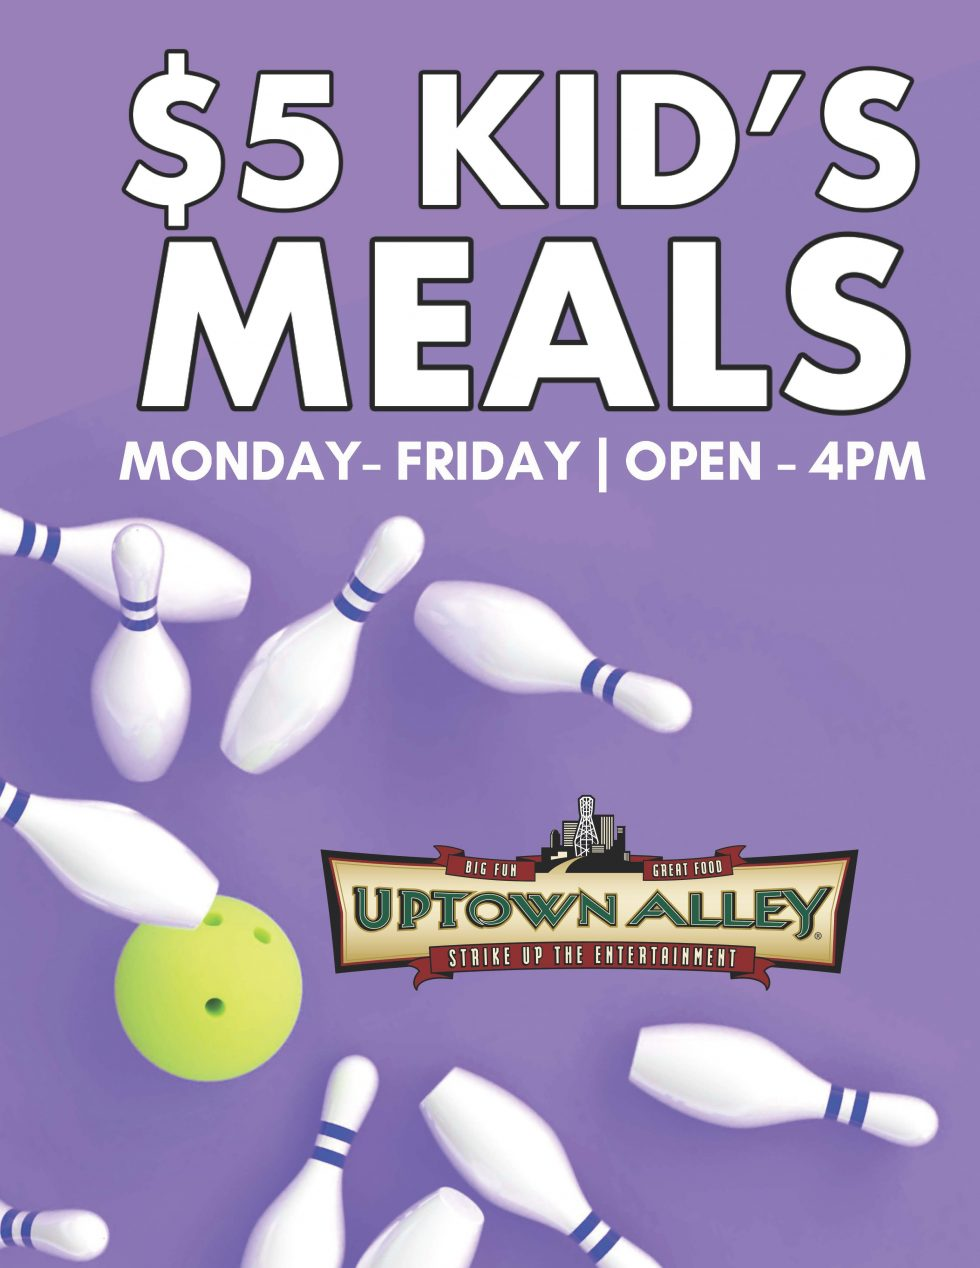 5 KIds Meals open 4pm